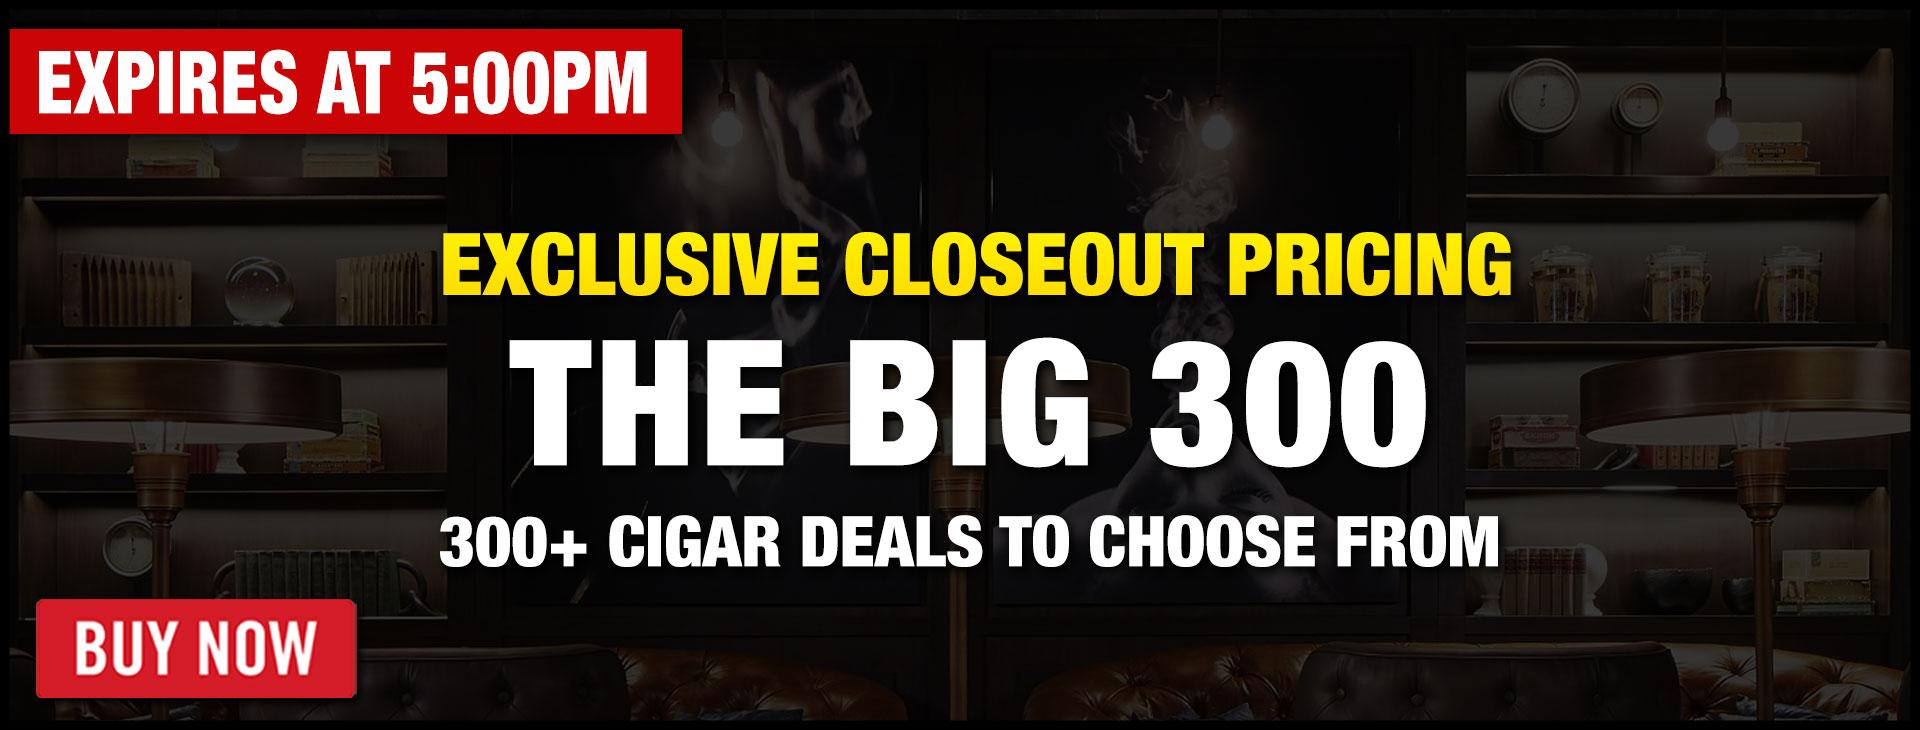 the-big-300-2021-3-banner.jpg